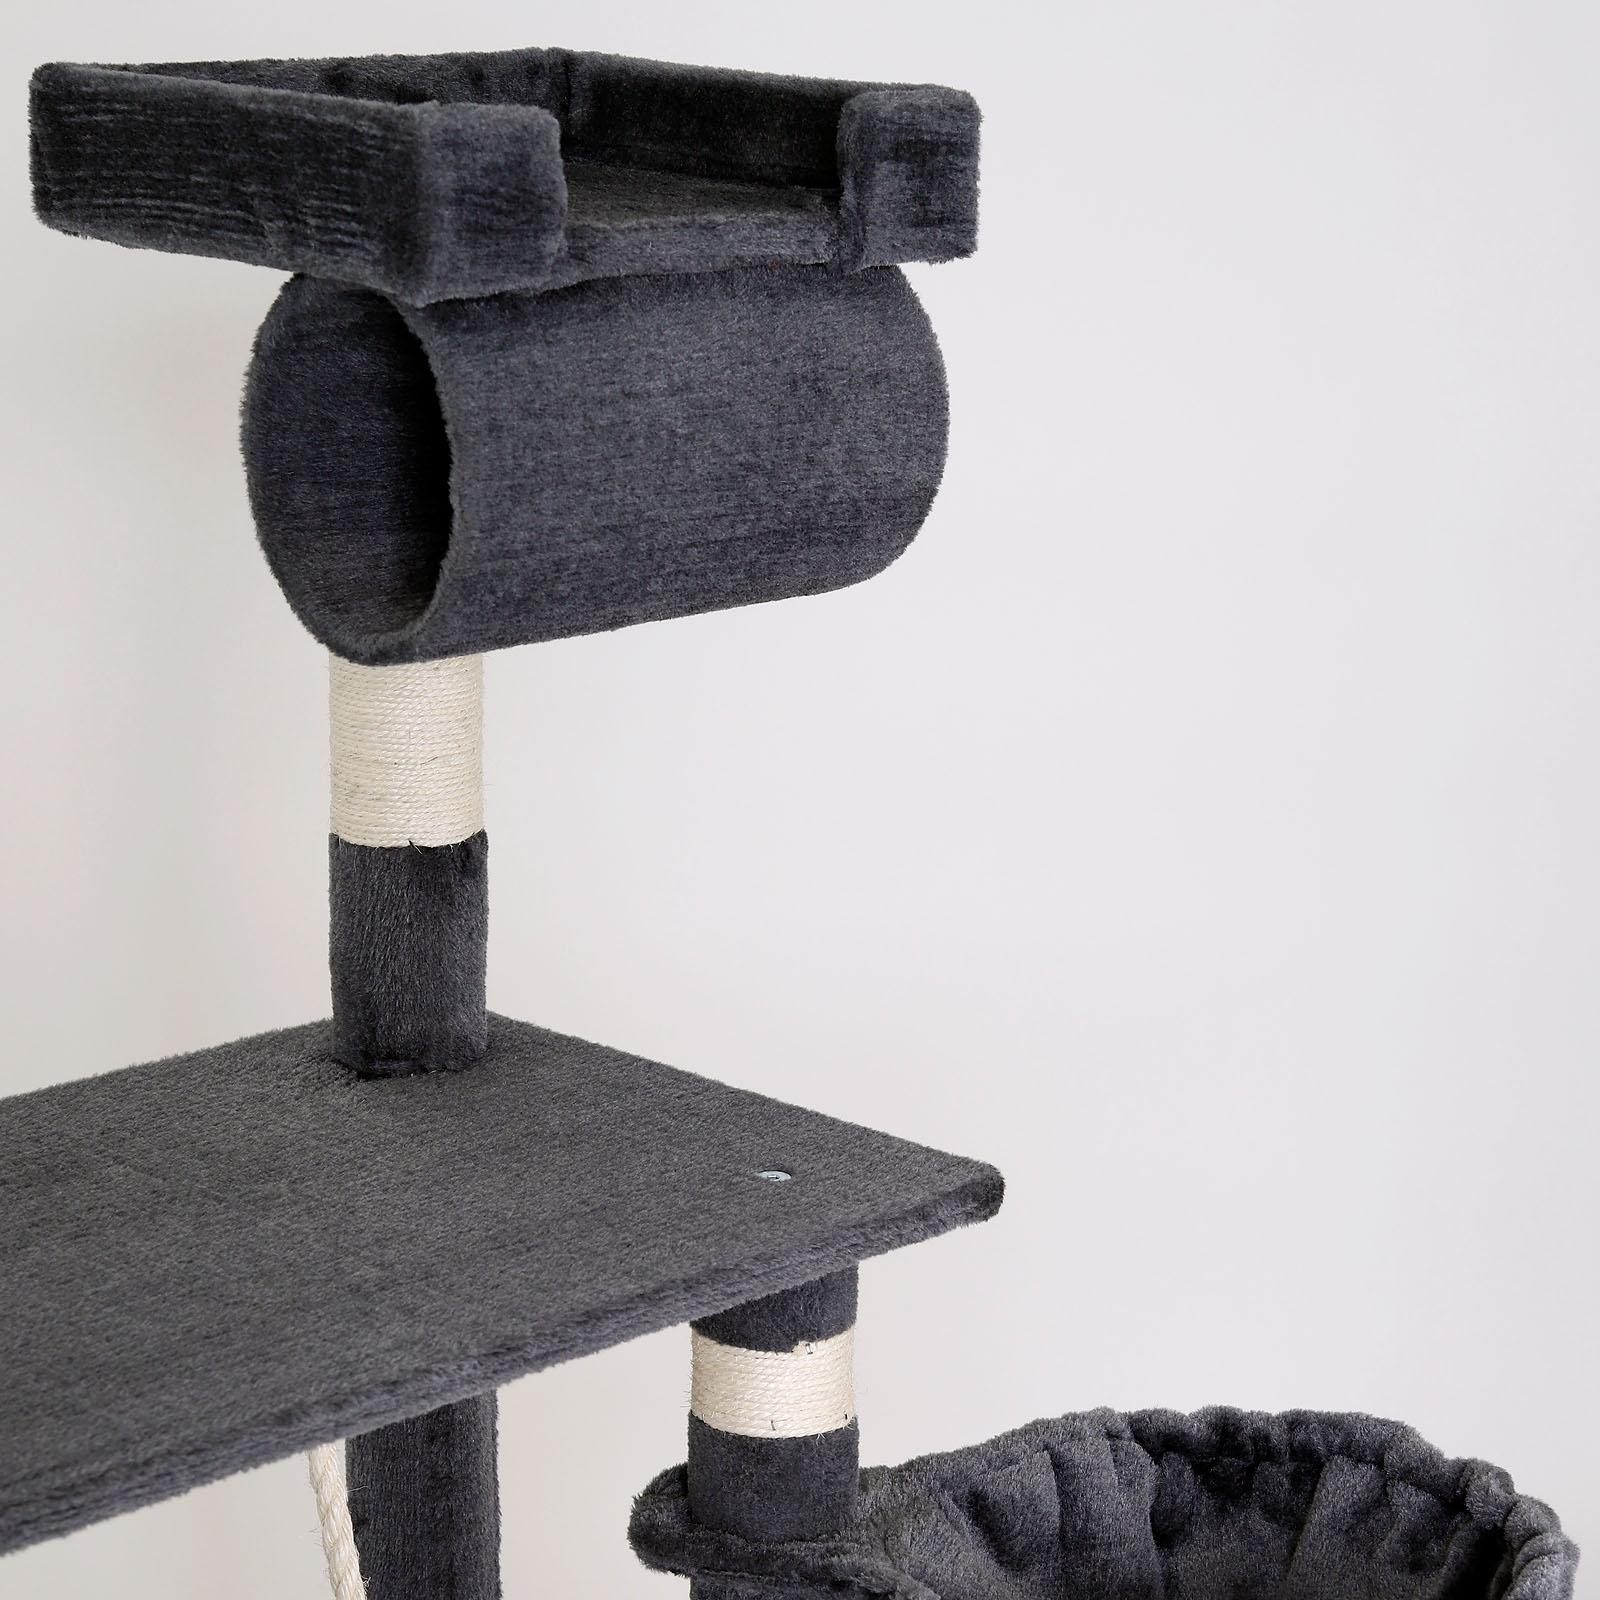 kratzbaum katzenkratzbaum kletterbaum f r katzen katzenbaum extra breit ebay. Black Bedroom Furniture Sets. Home Design Ideas